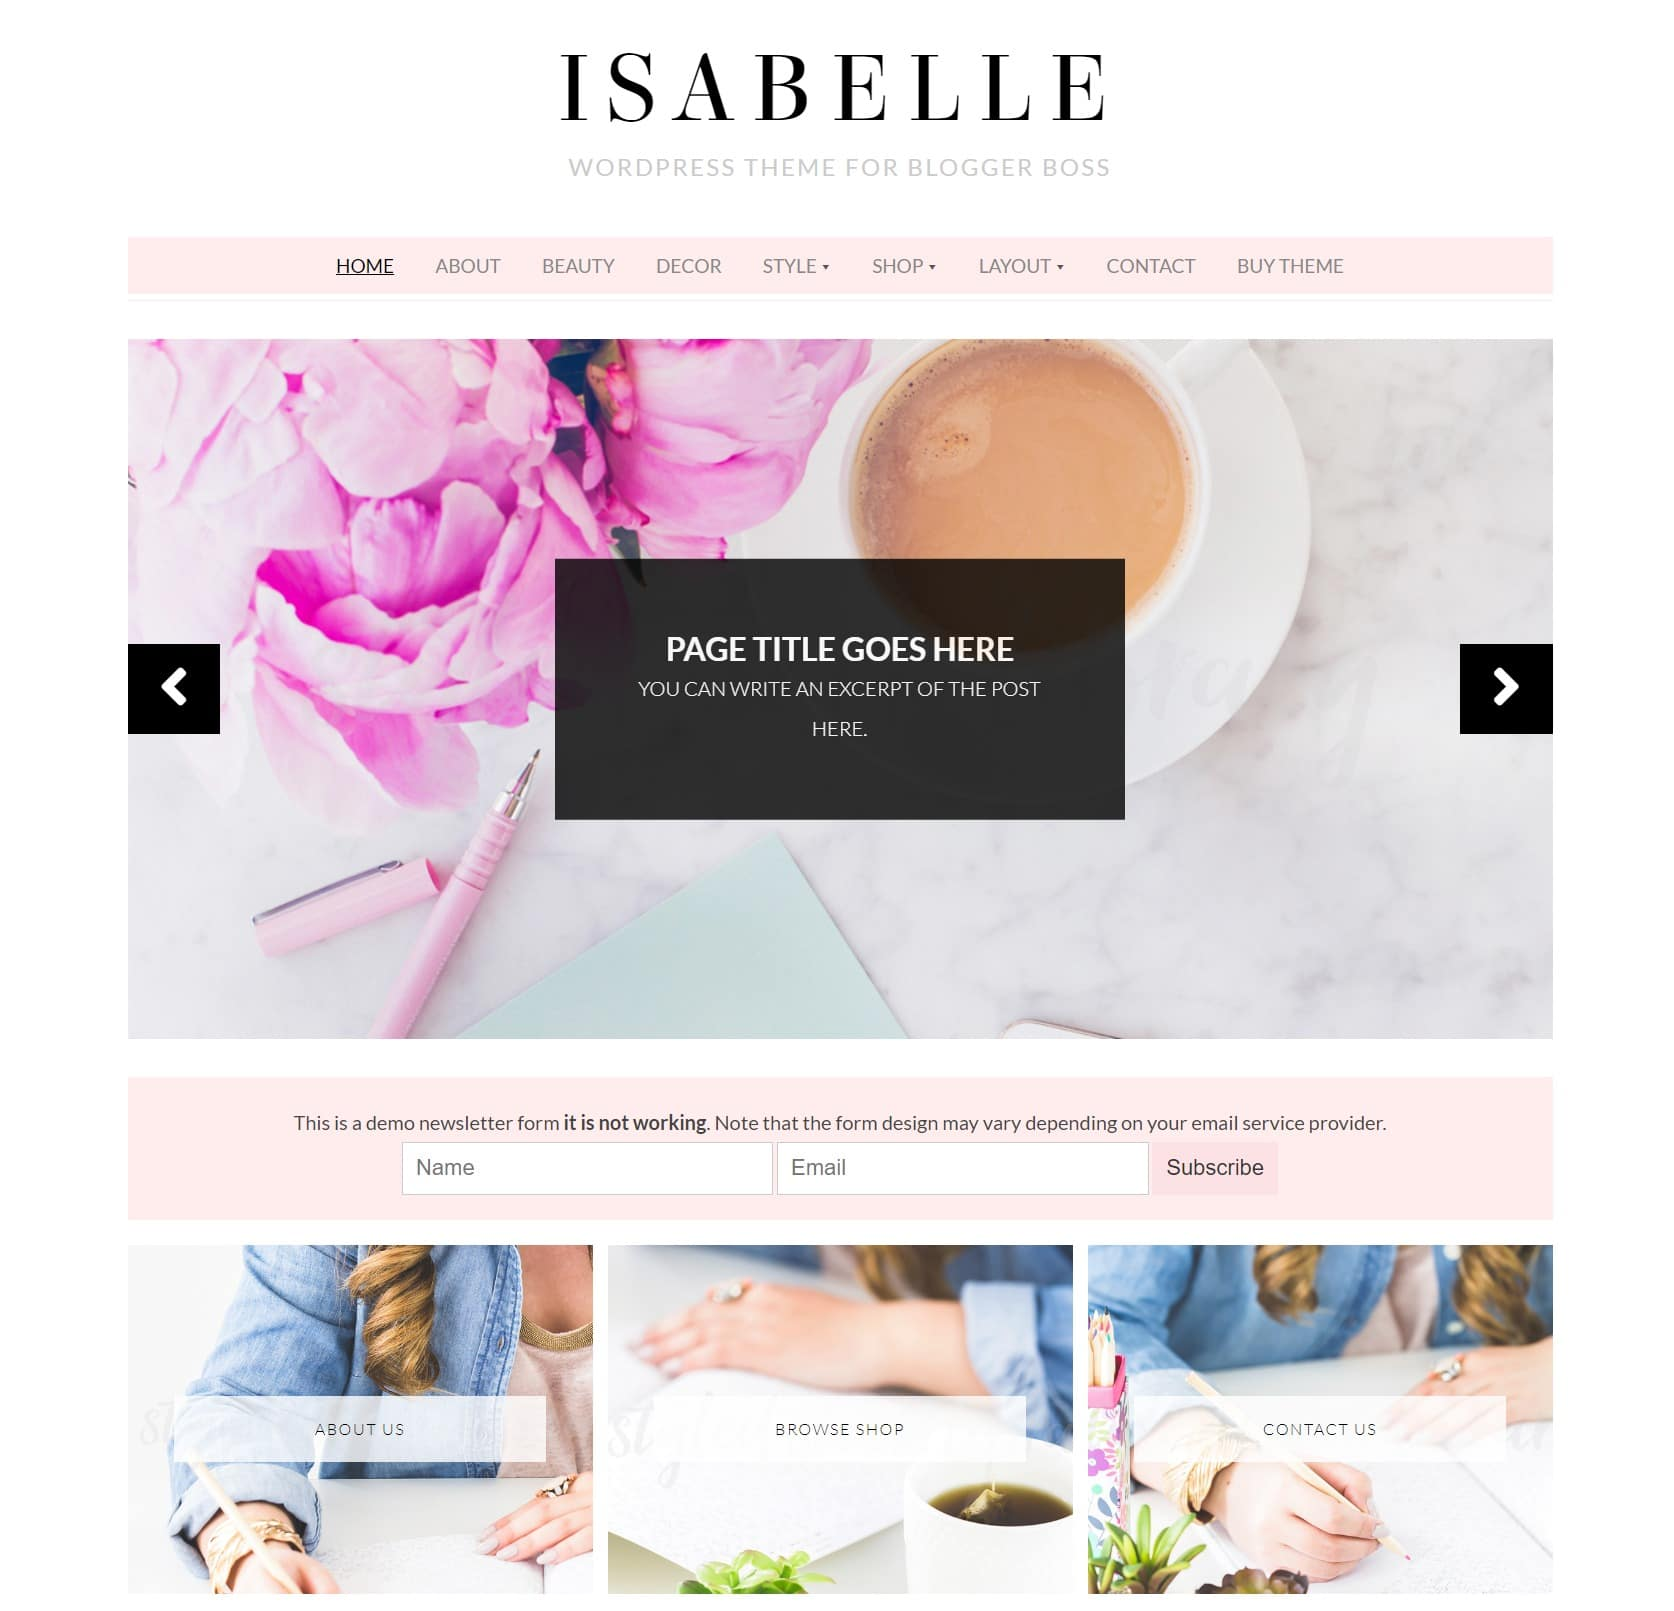 Изабель - WordPress Theme для образа жизни Blogger Boss